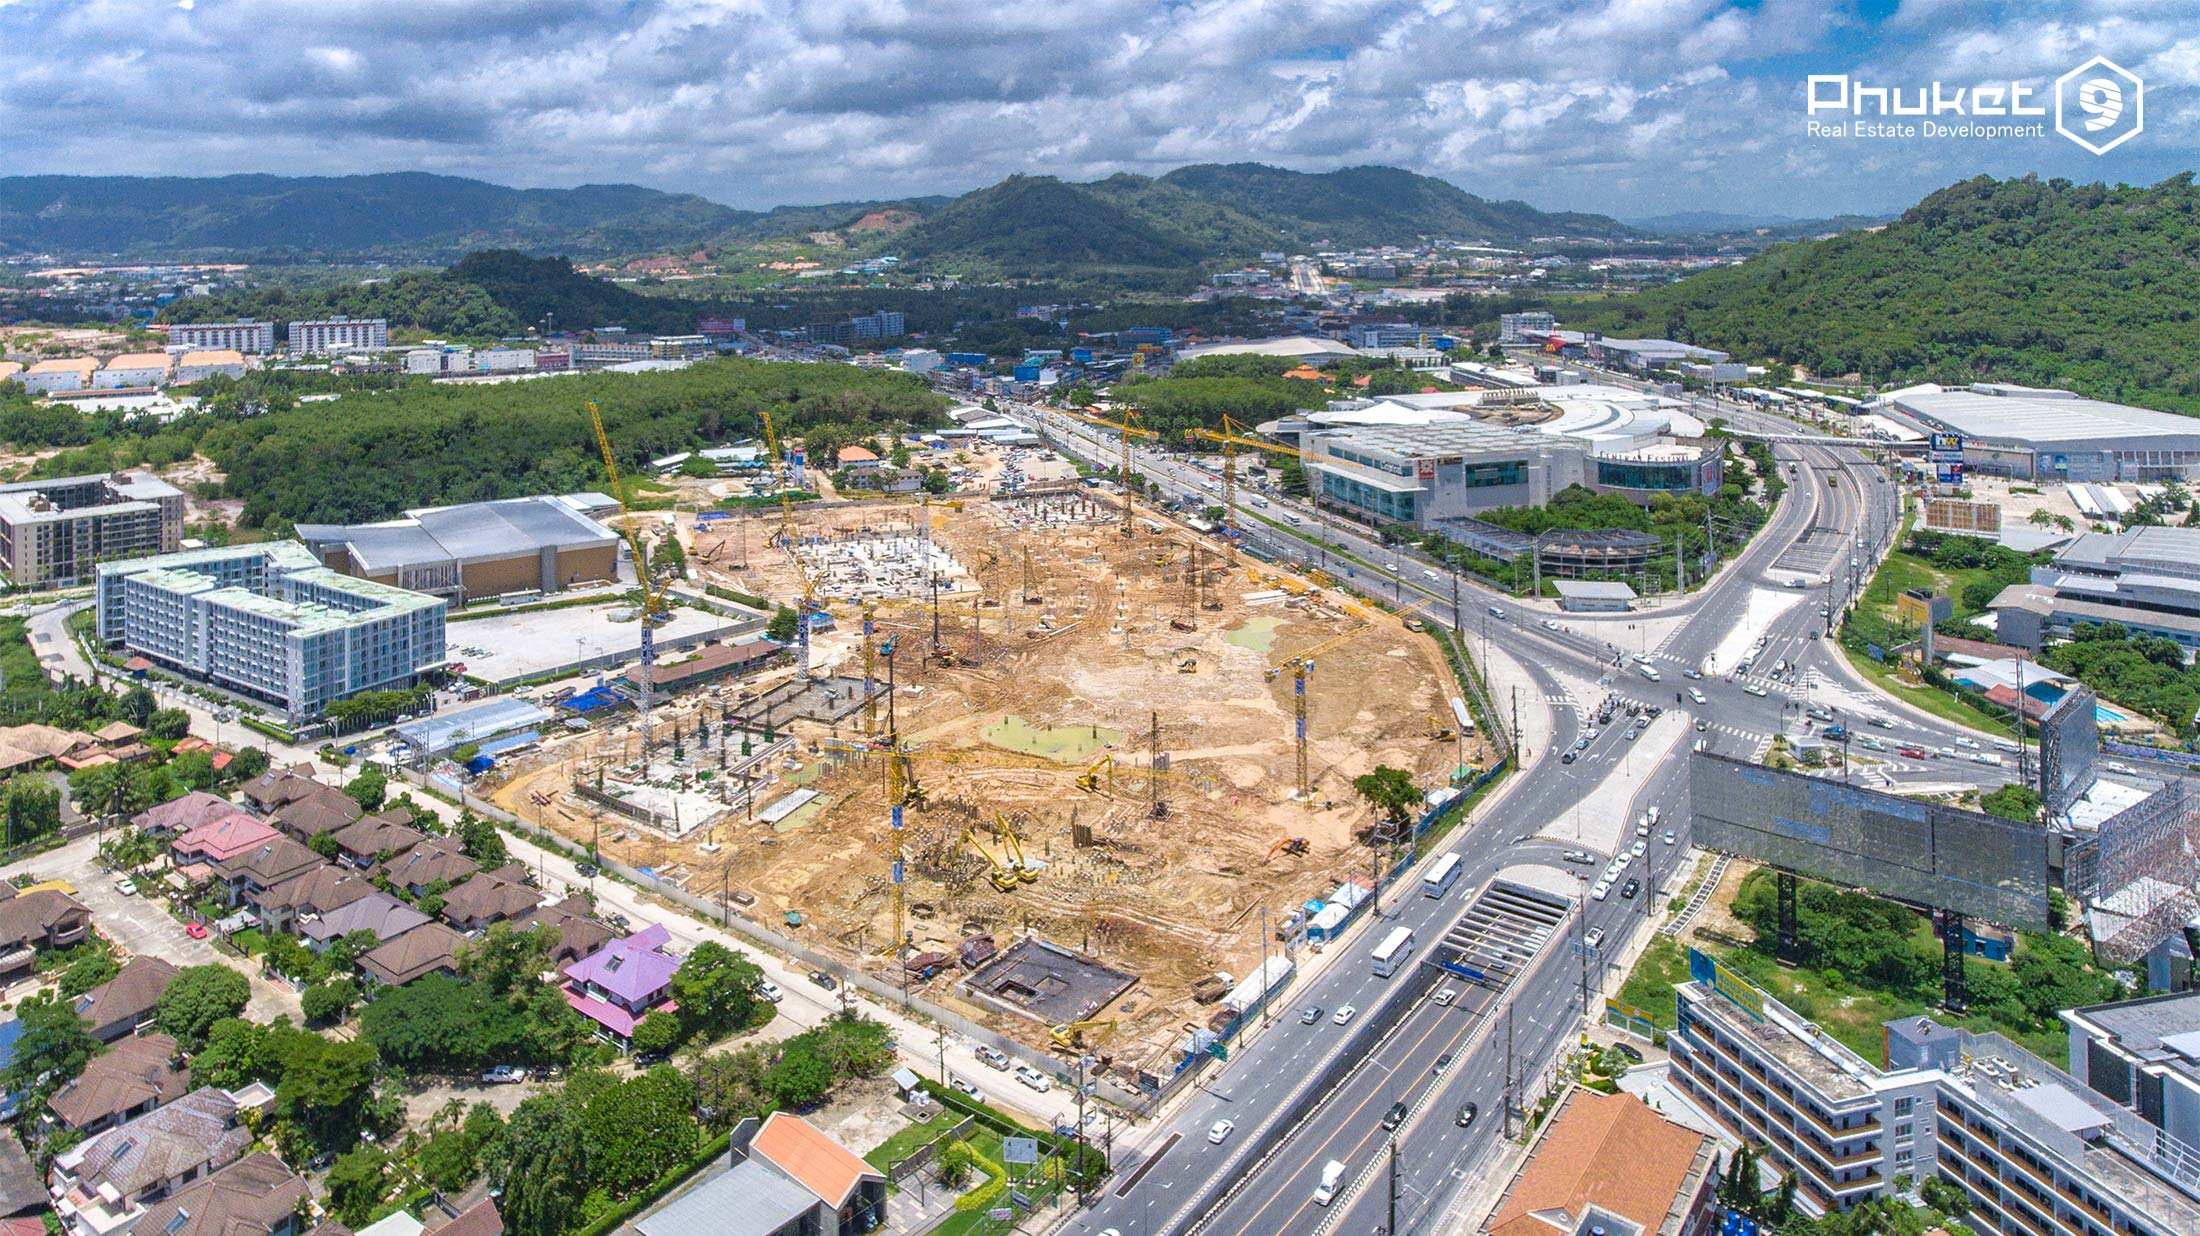 central phuket construction